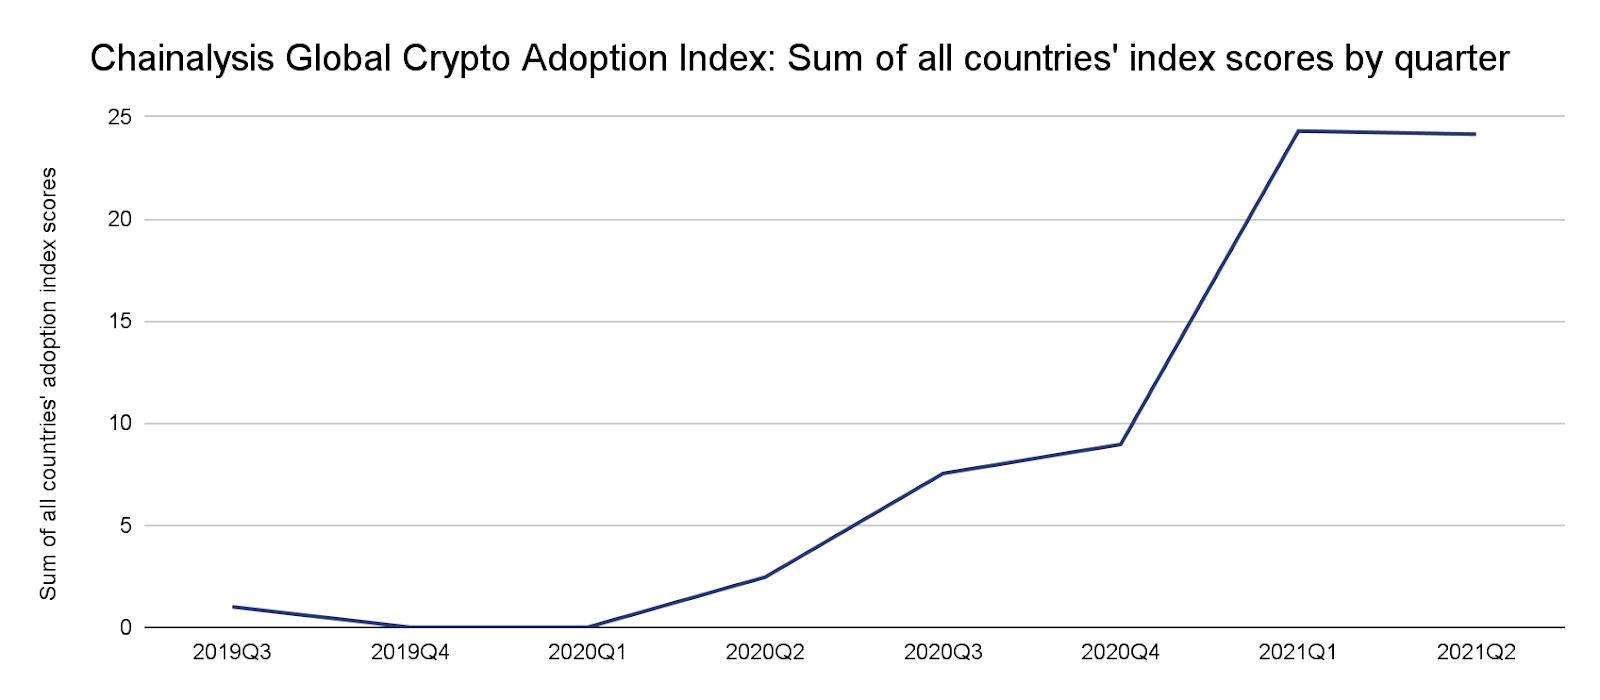 Global cryptocurrency adoption is skyrocketing